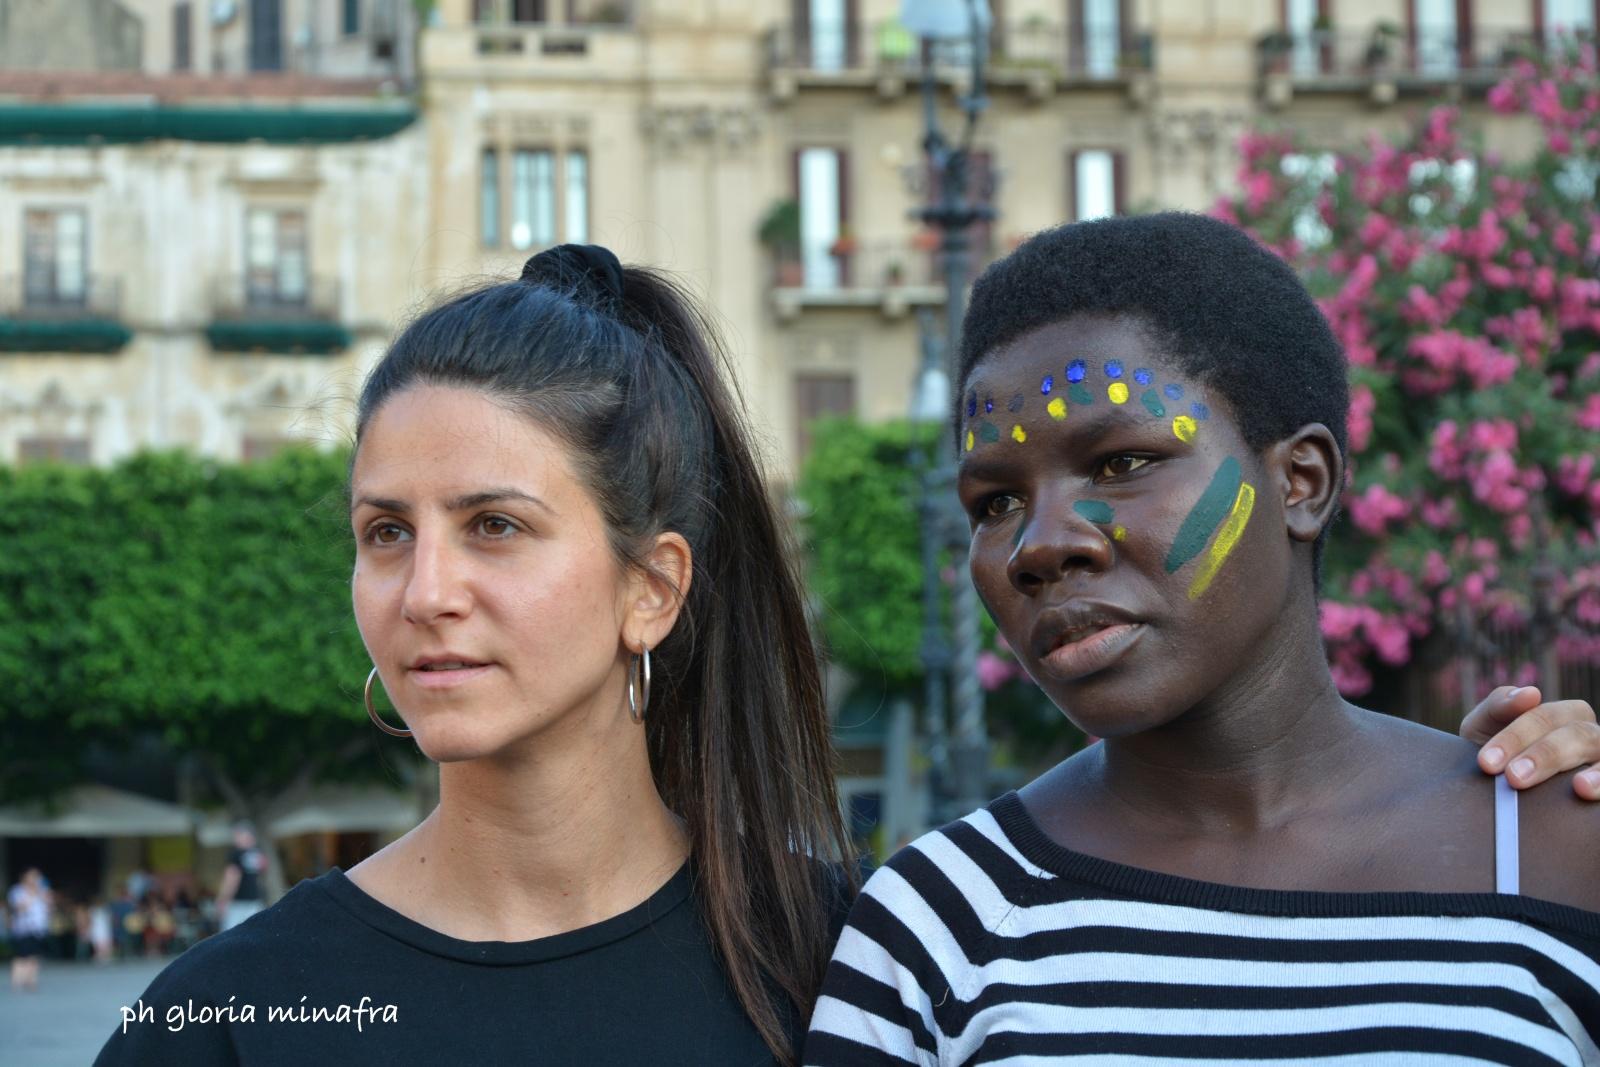 Identità: Performance di arte terapia e multiculturalità